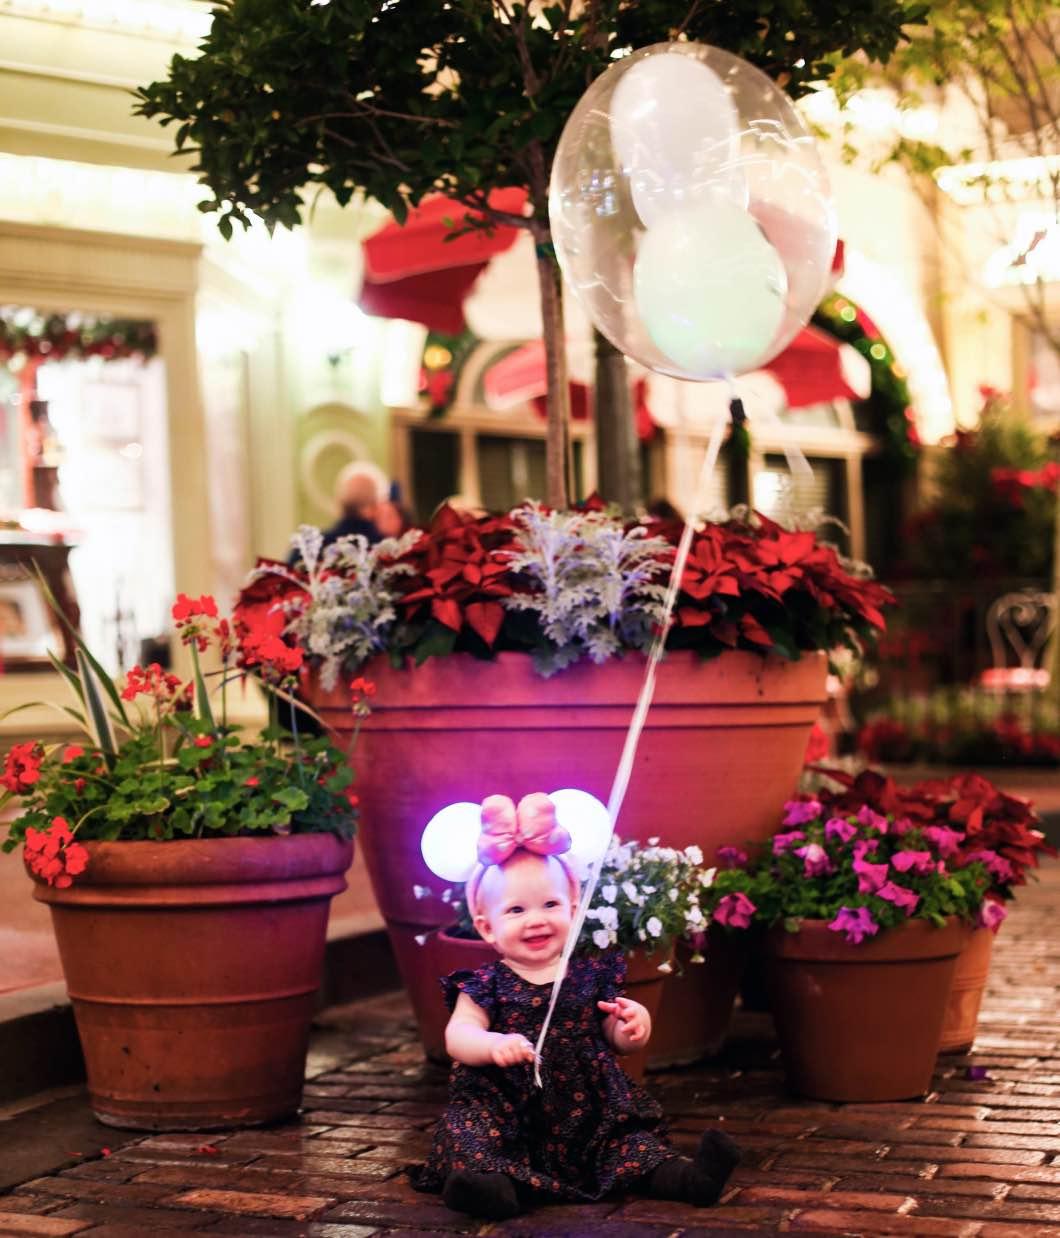 Mickeys Very Merry Christmas Main Street baby - Holiday Attractions in Orlando by Atlanta travel blogger Happily Hughes